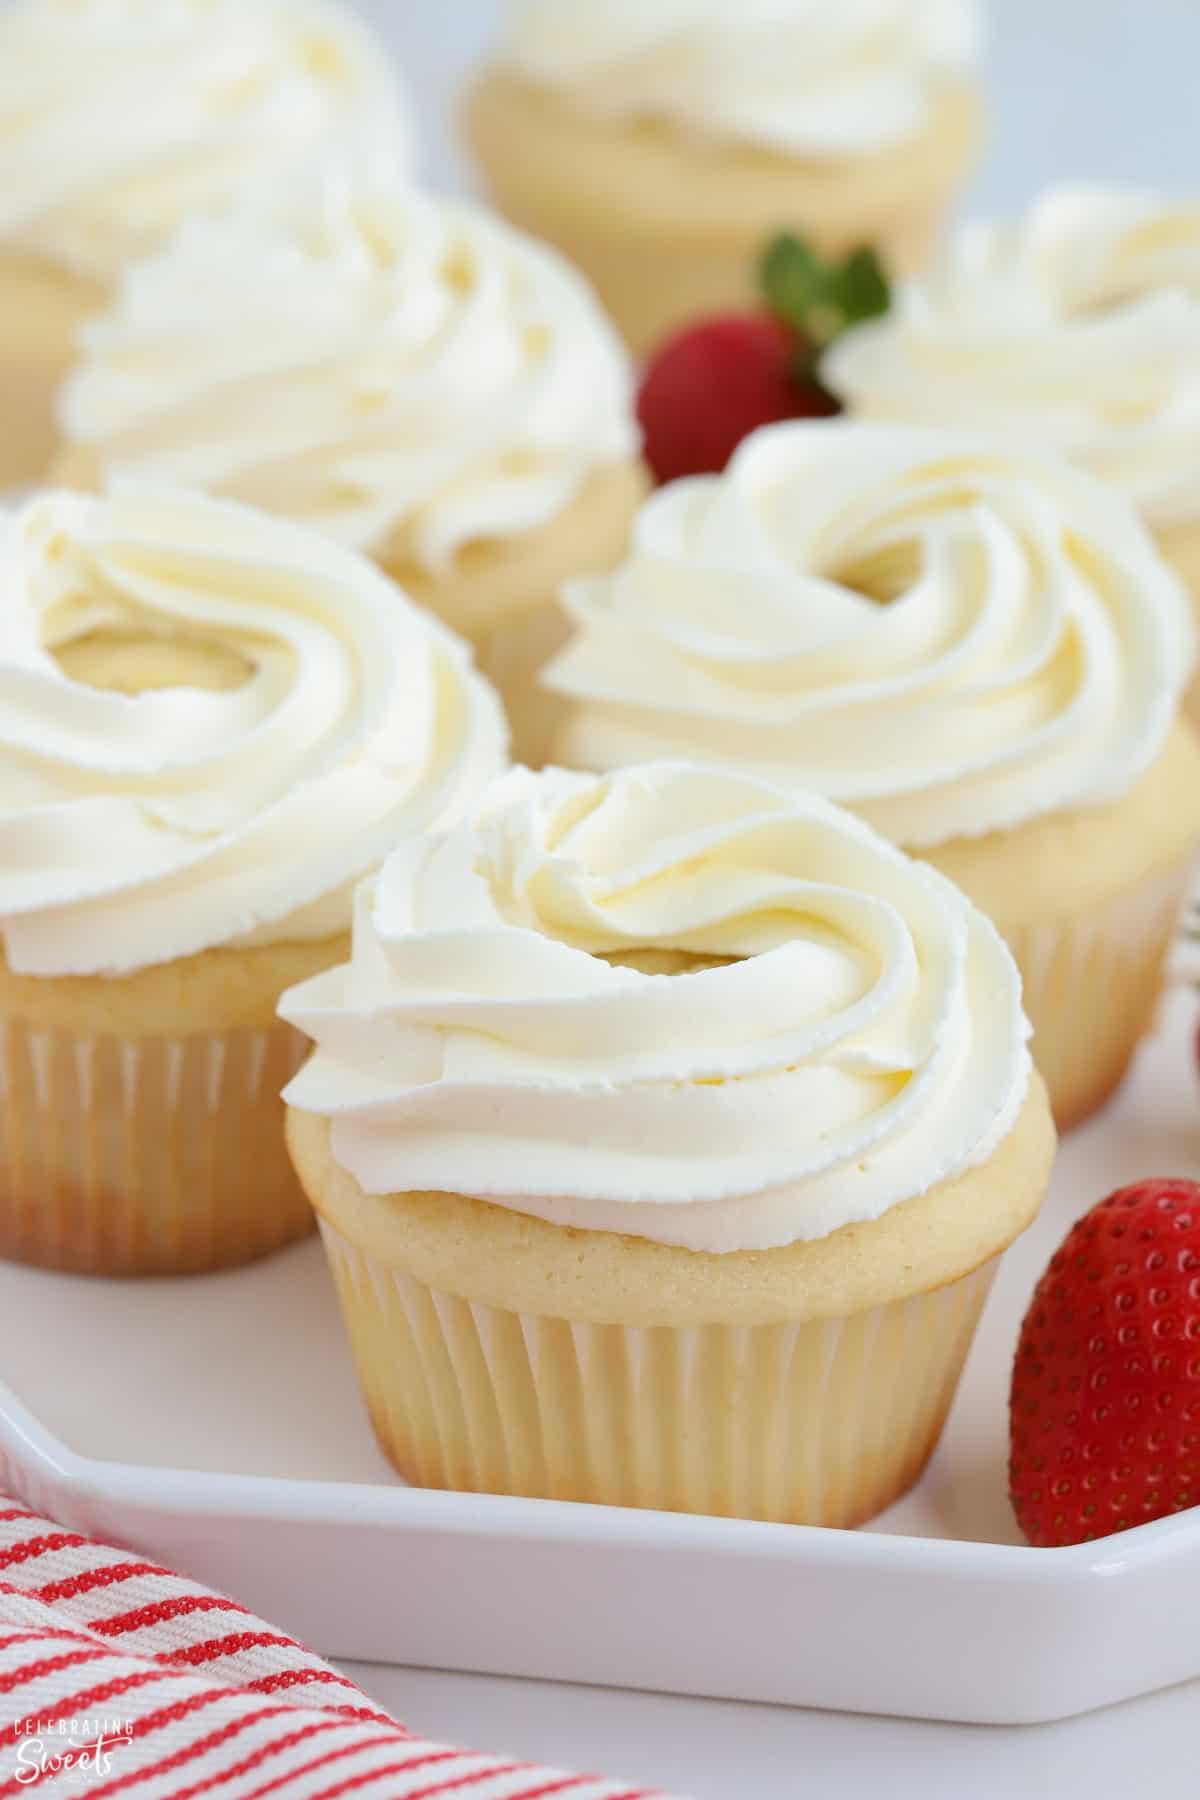 Closeup of vanilla cupcake with swirled white frosting